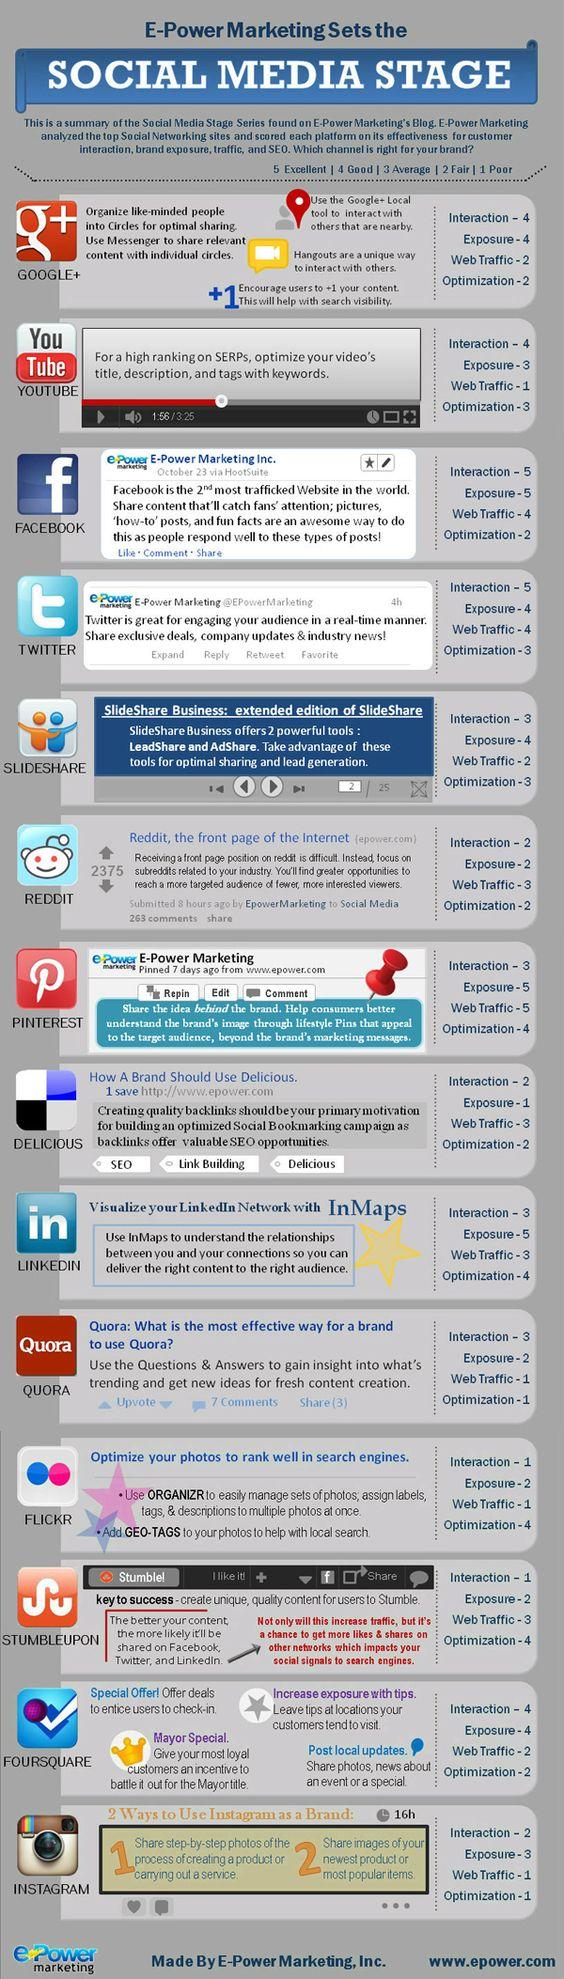 Effectiveness Comparison Of Top #SocialMedia Networks #Infographic